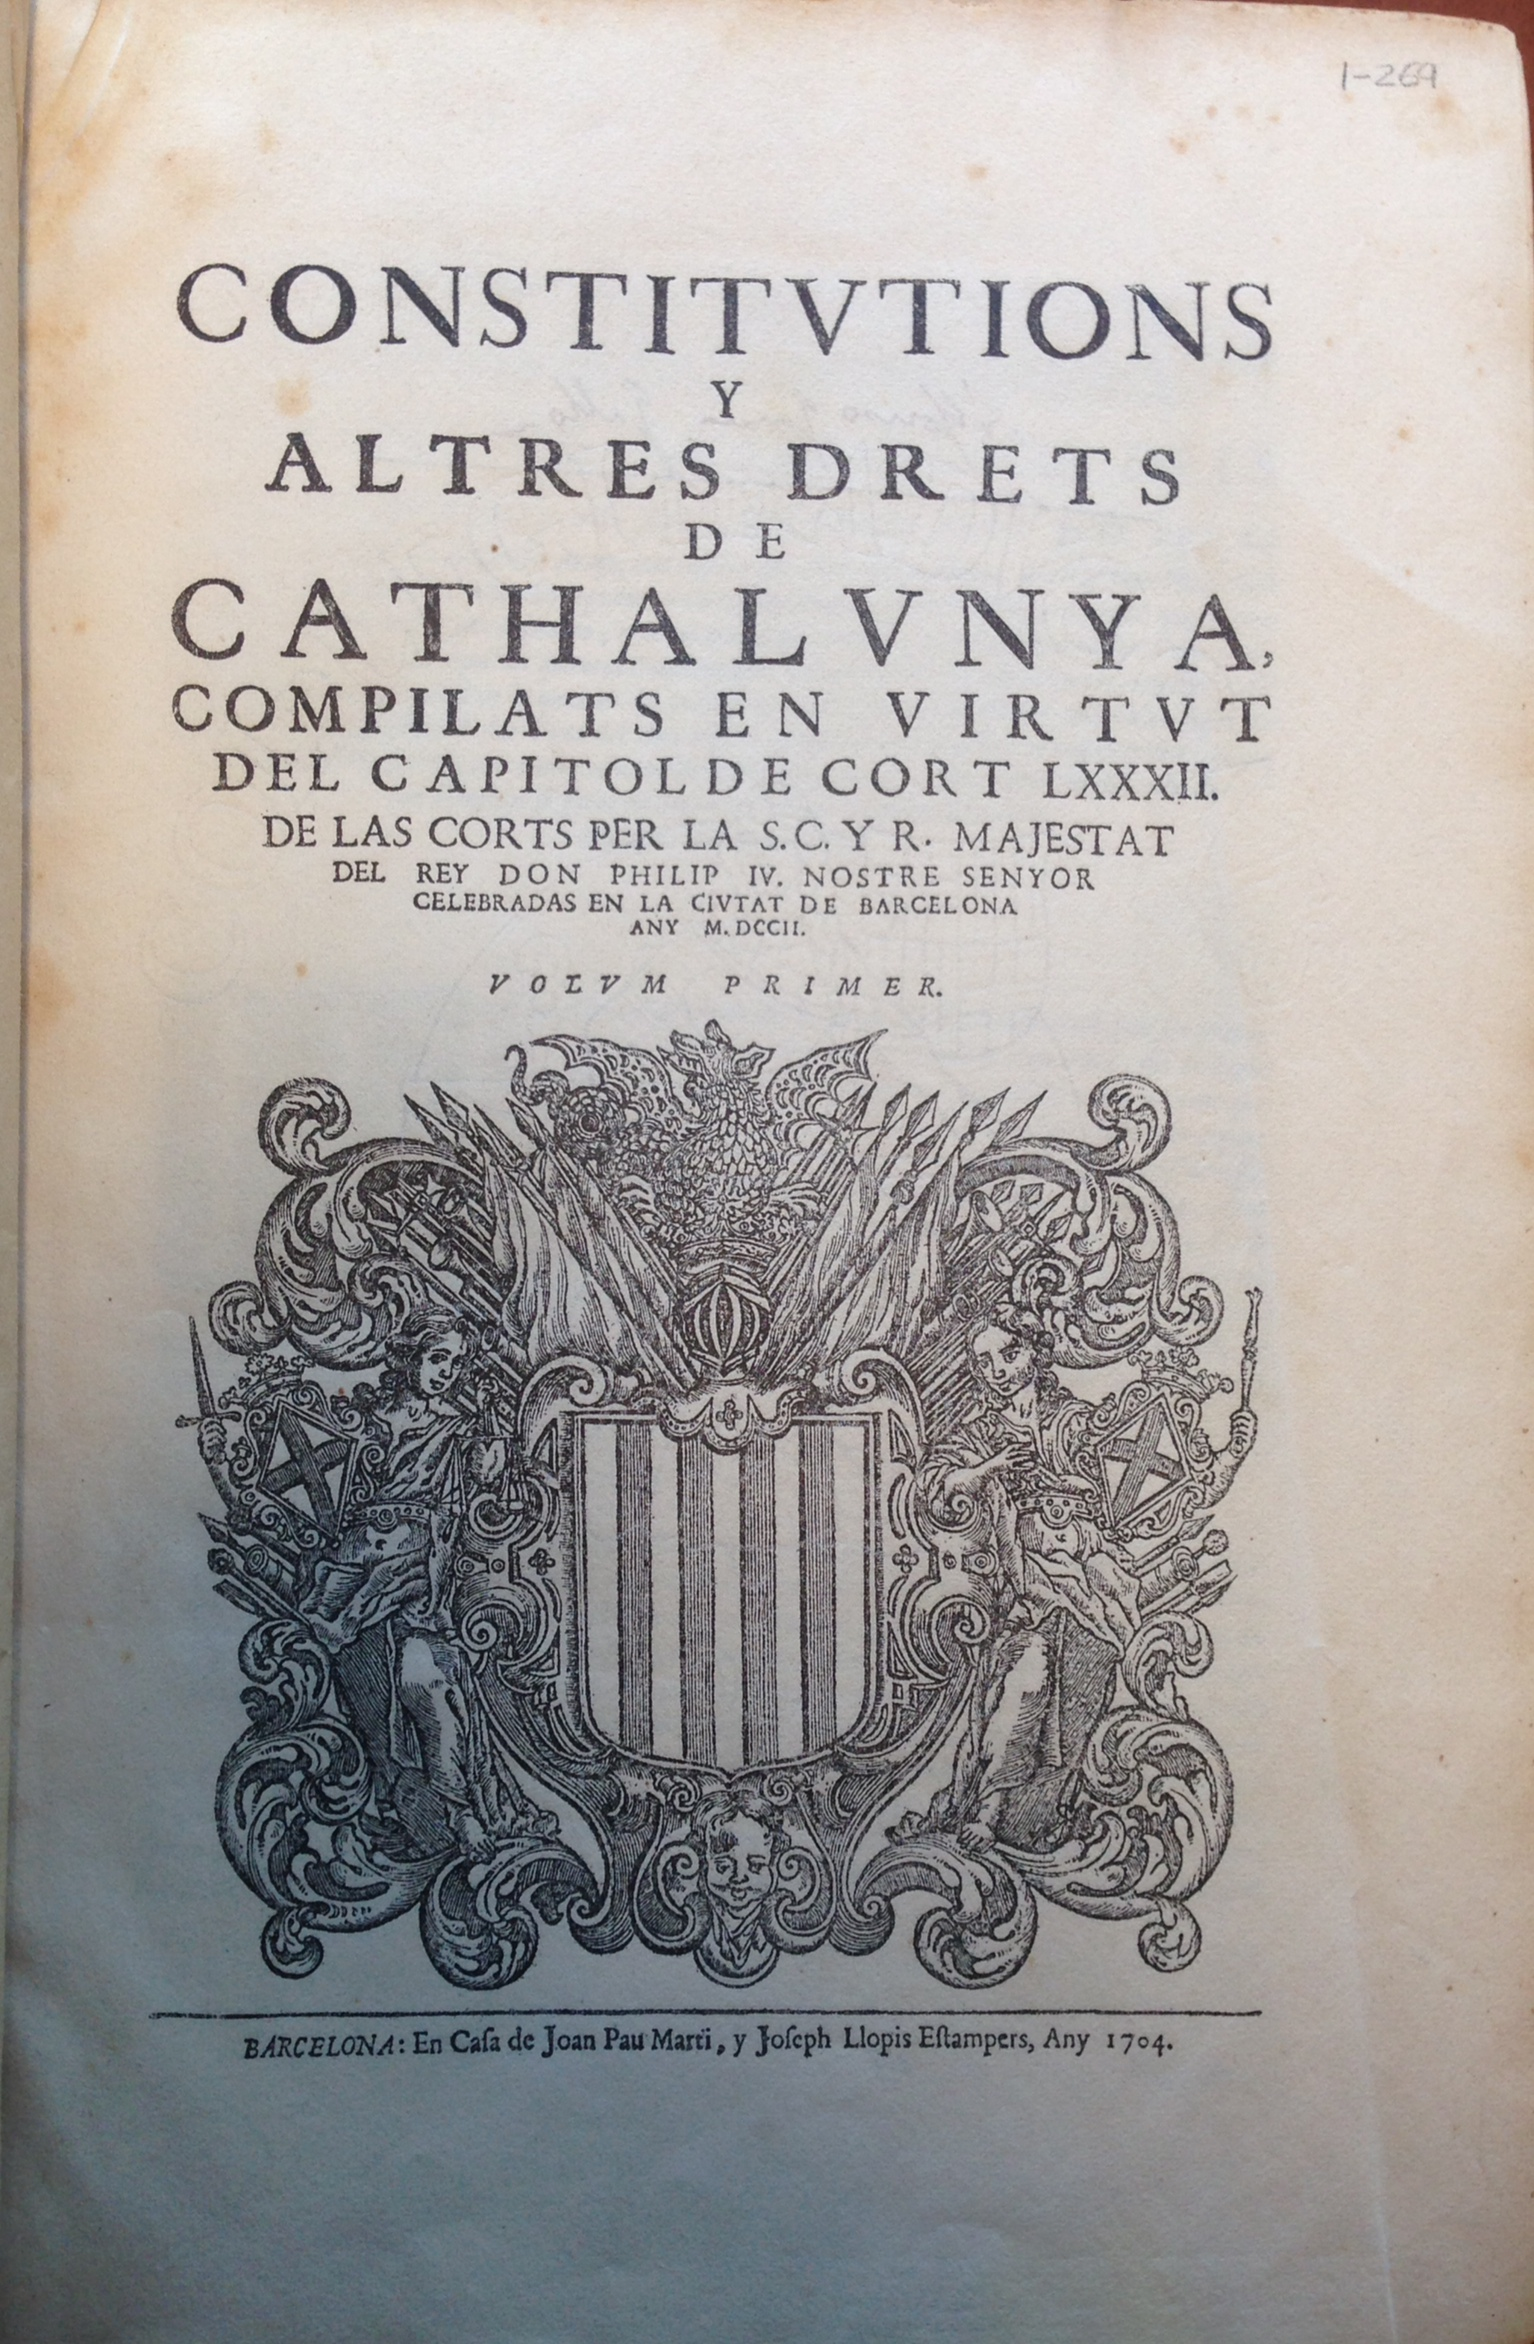 Constitutions y altres drets de Cathalunya, 1704